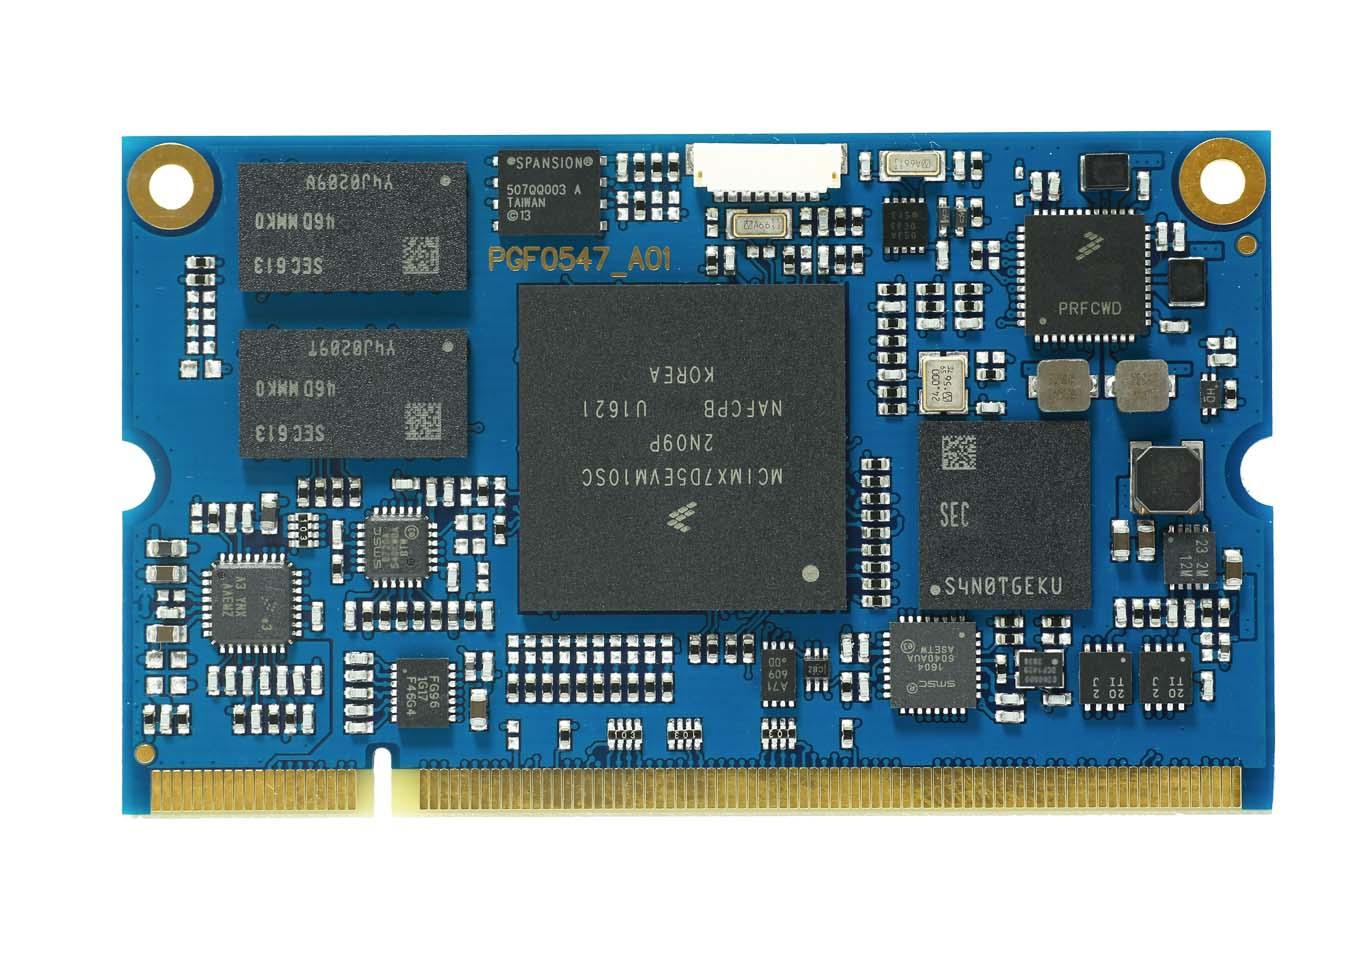 3SM1006 SoM NXP i.MX7 Dual